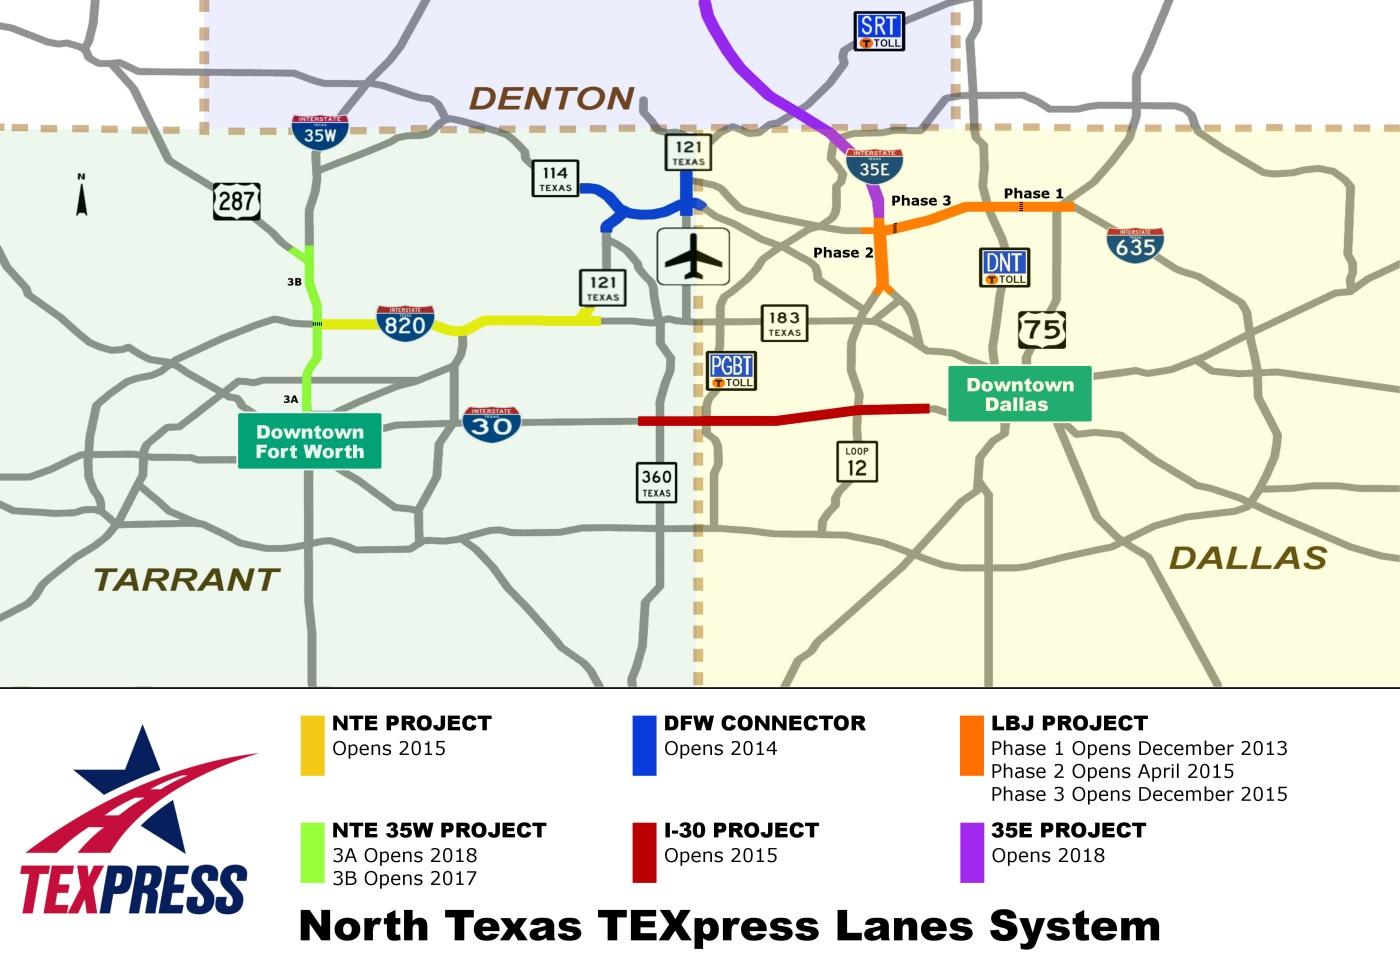 Dallas Traffic Map on